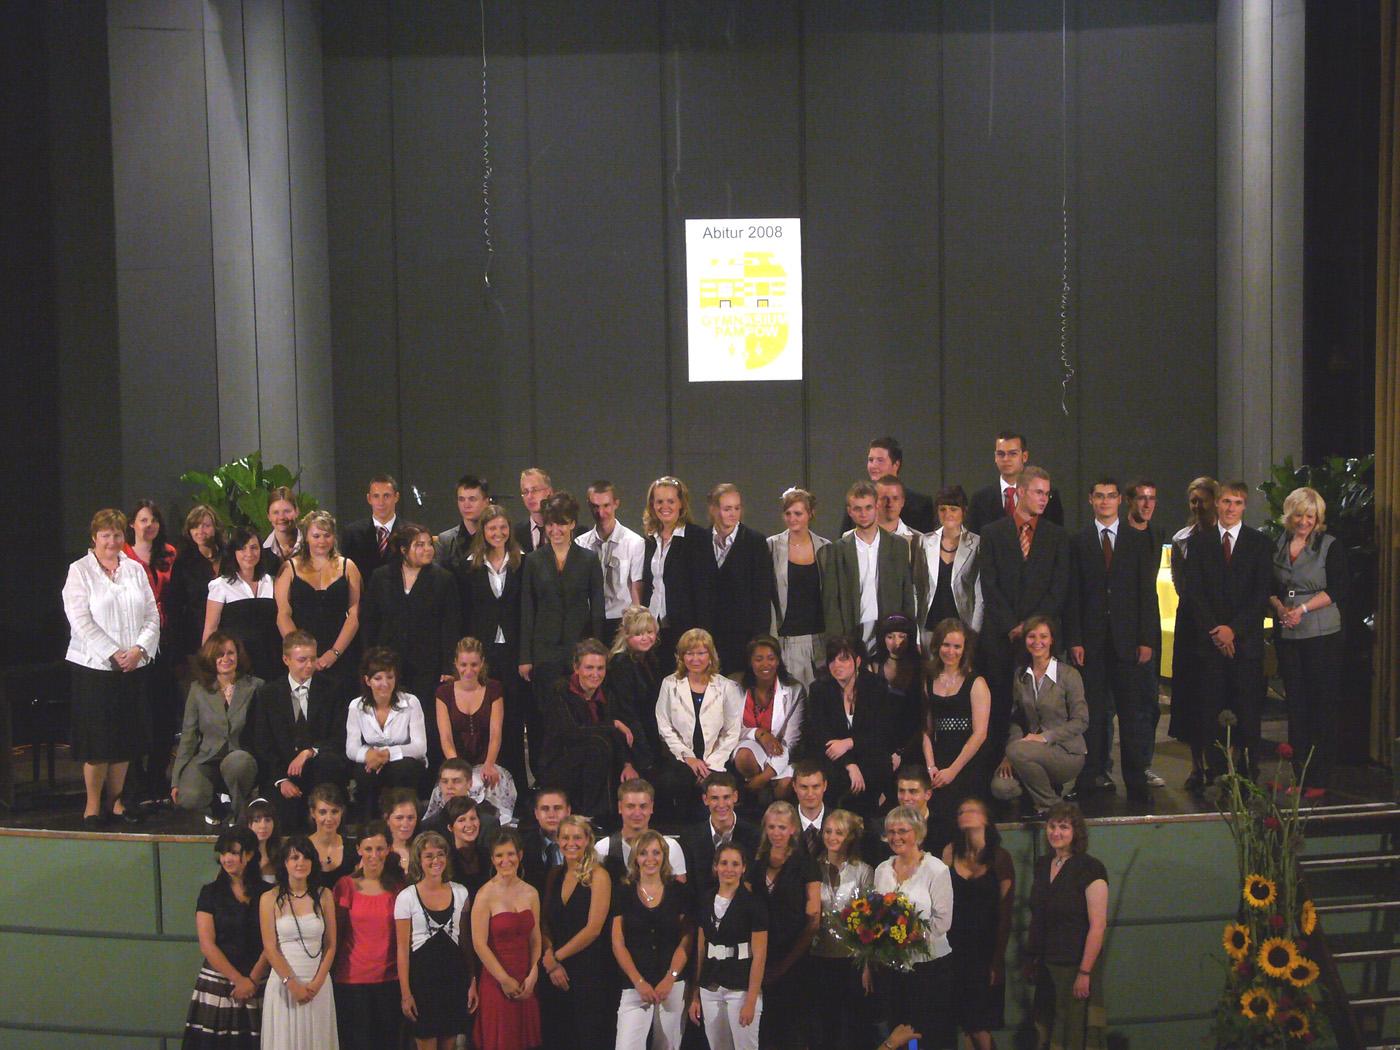 abitur-2008-jg-12